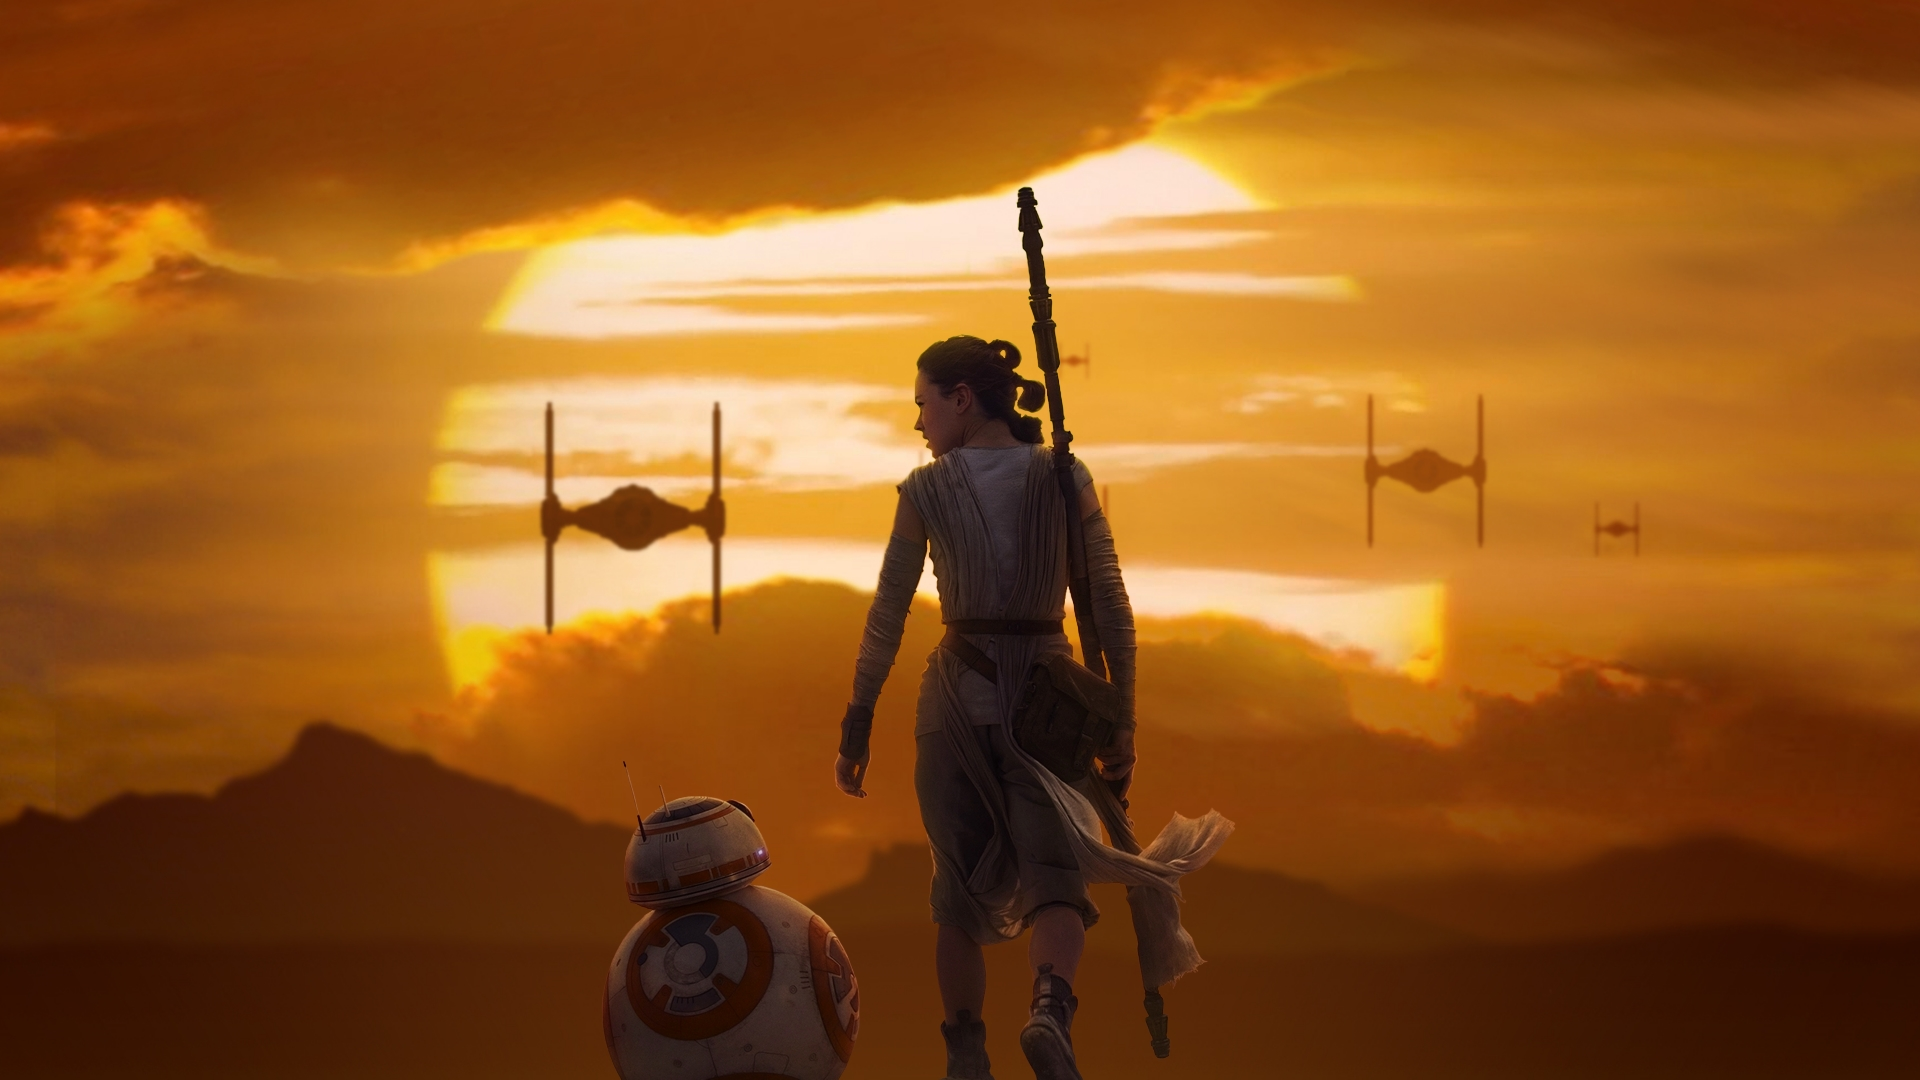 42 The Force Awakens Hd Wallpaper On Wallpapersafari